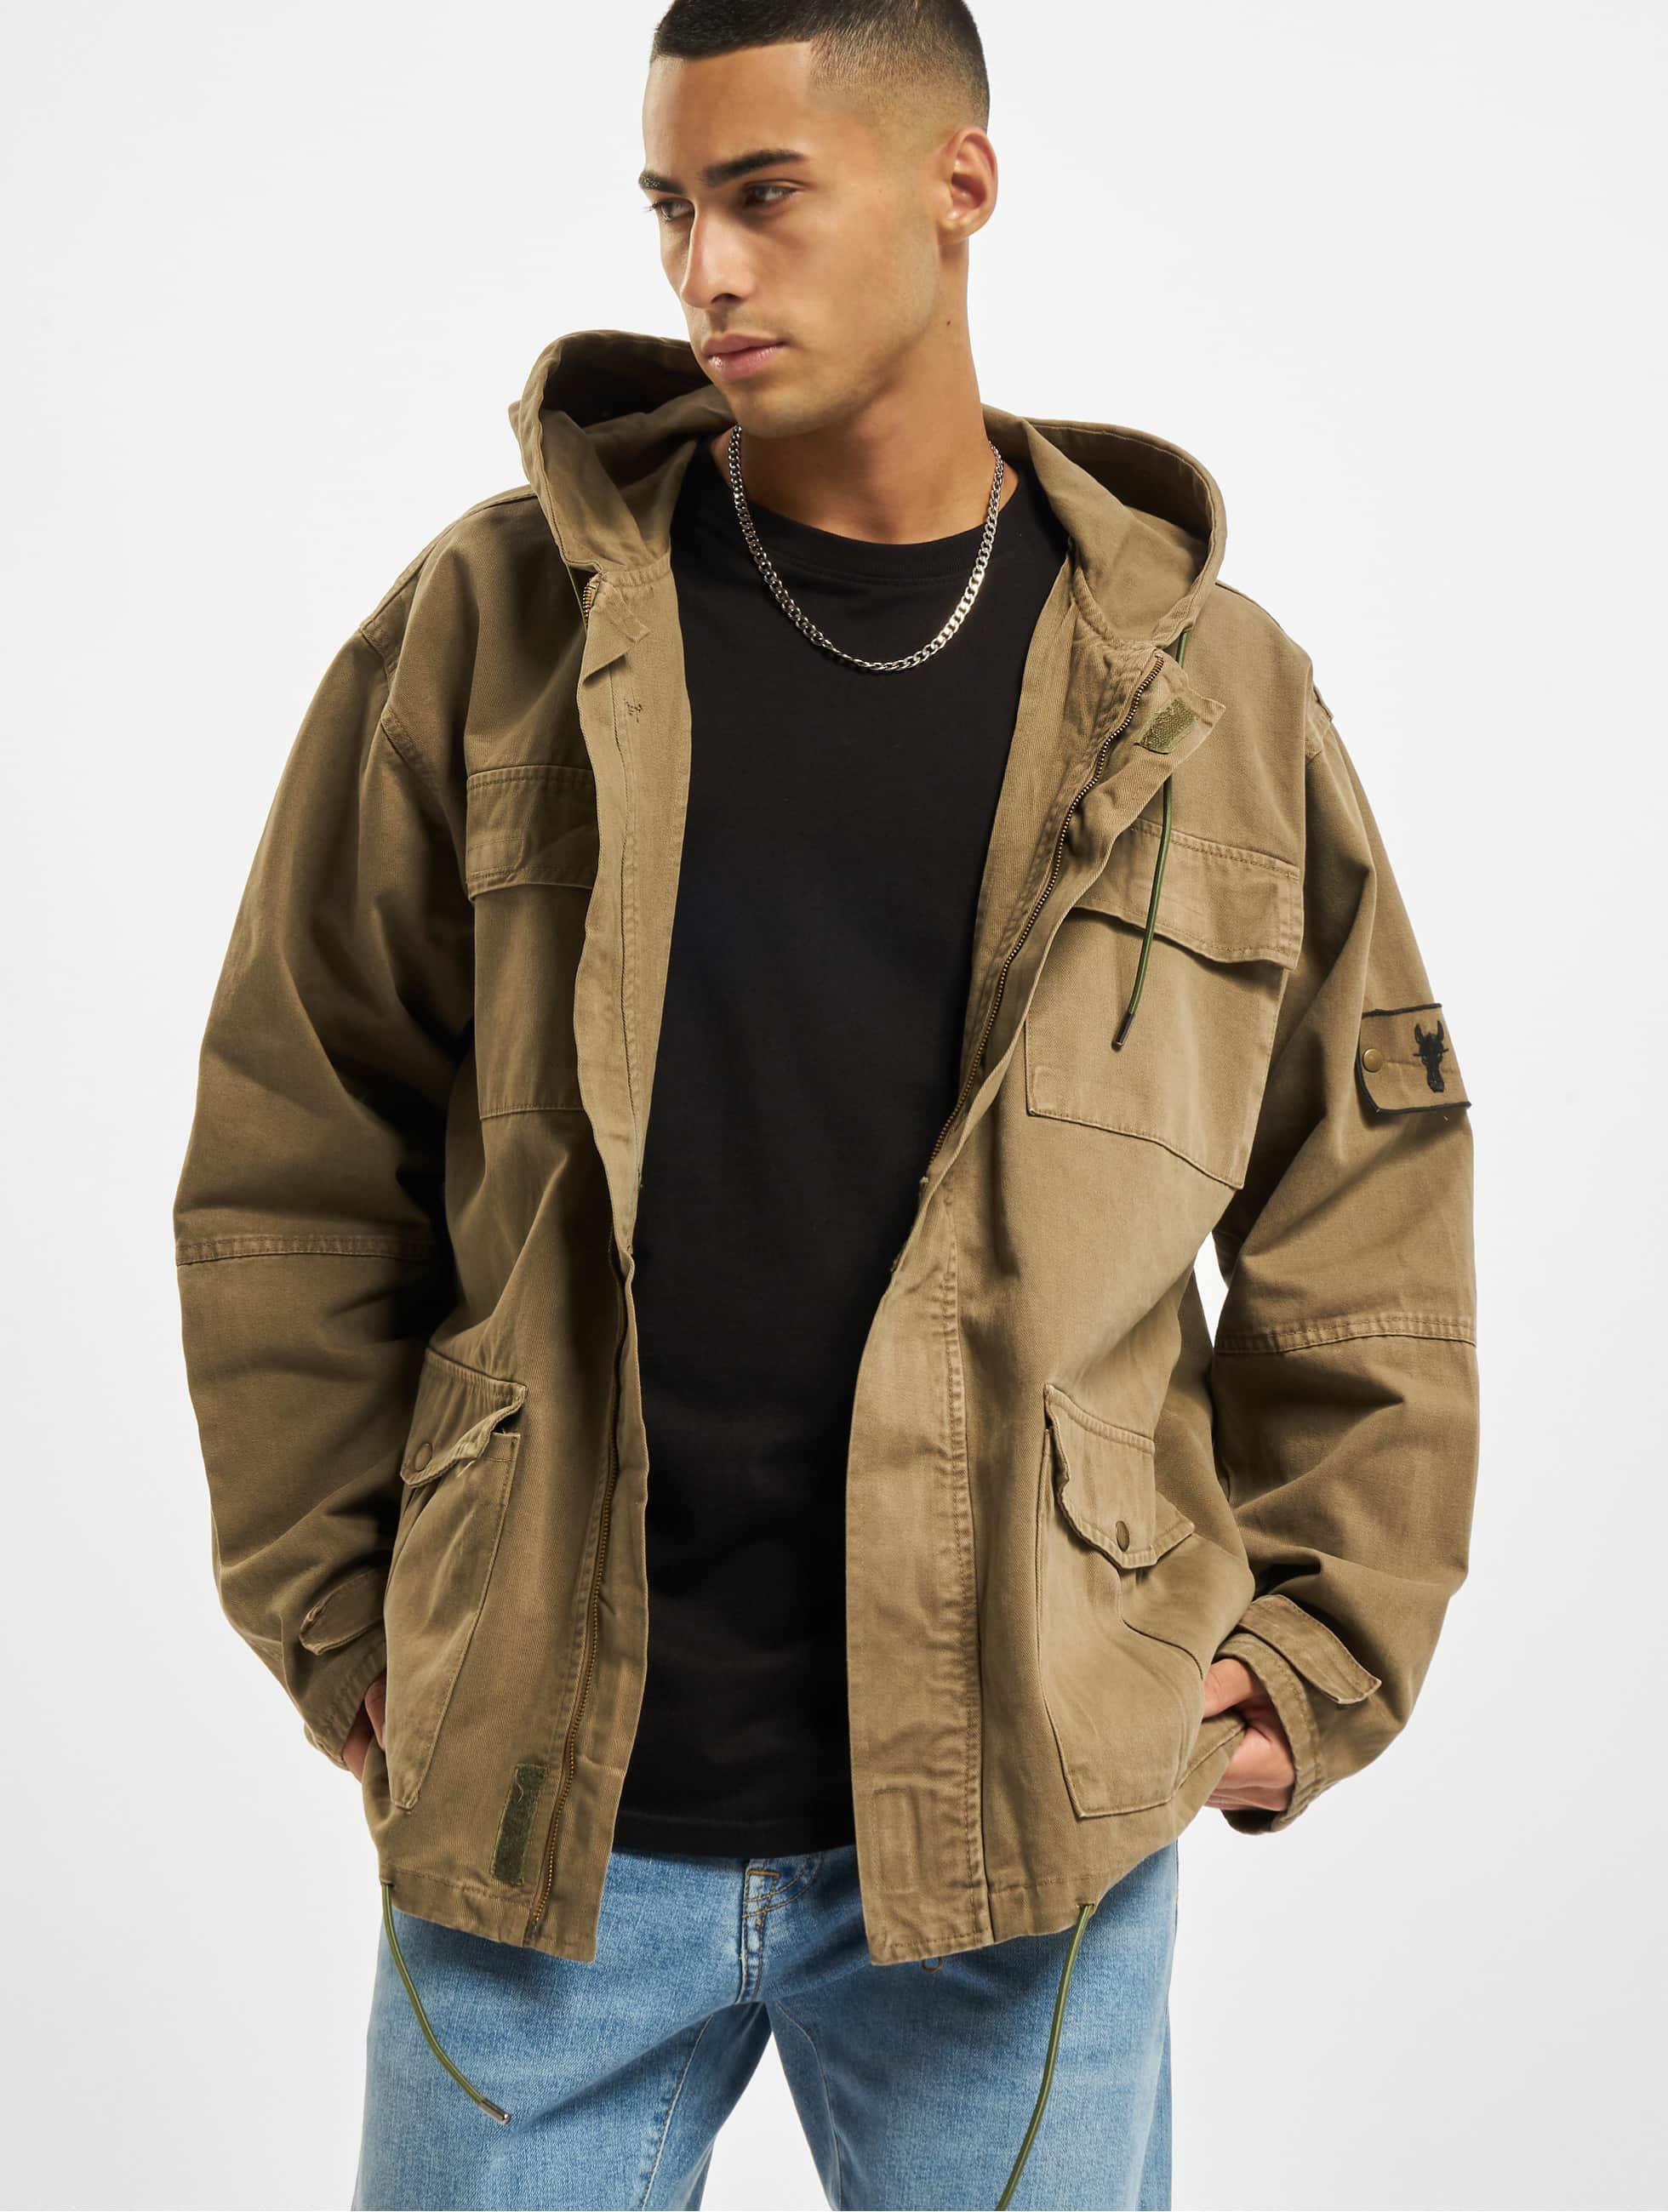 Cavallo de Ferro / Lightweight Jacket Oversized in olive XL